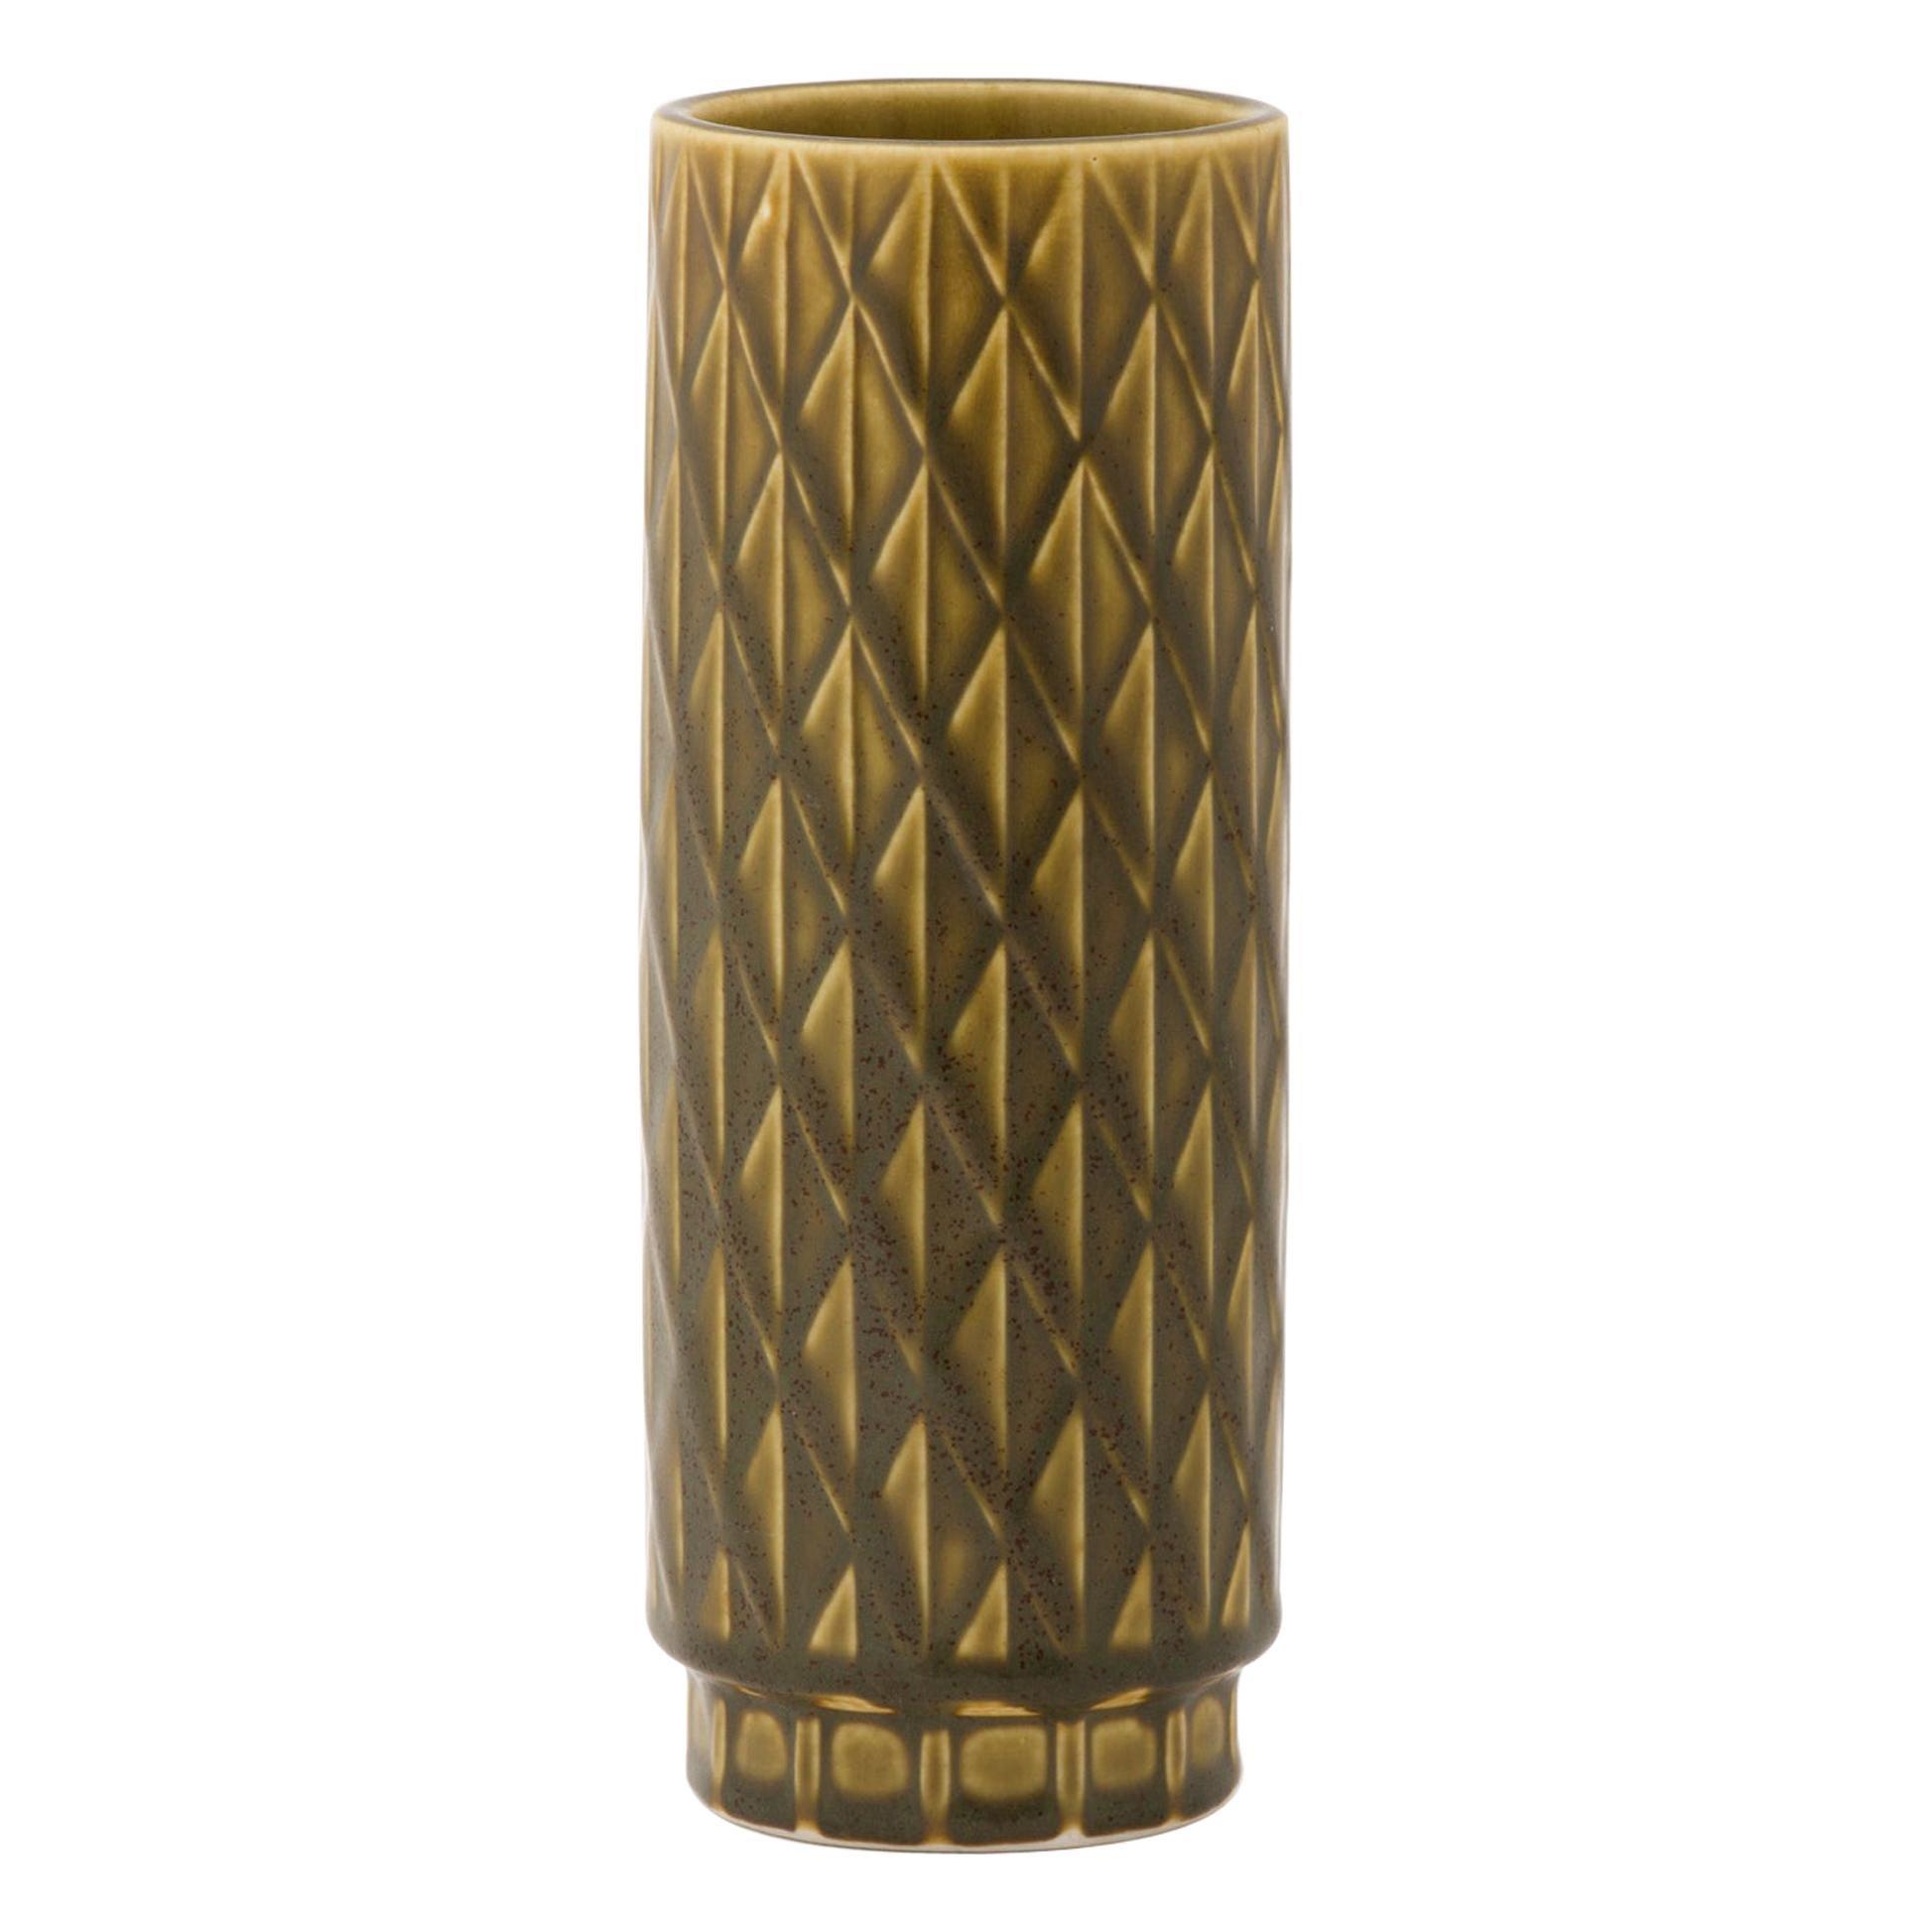 Gunnar Nylund Ceramic Vase for Rörstrand, Sweden, 1960s